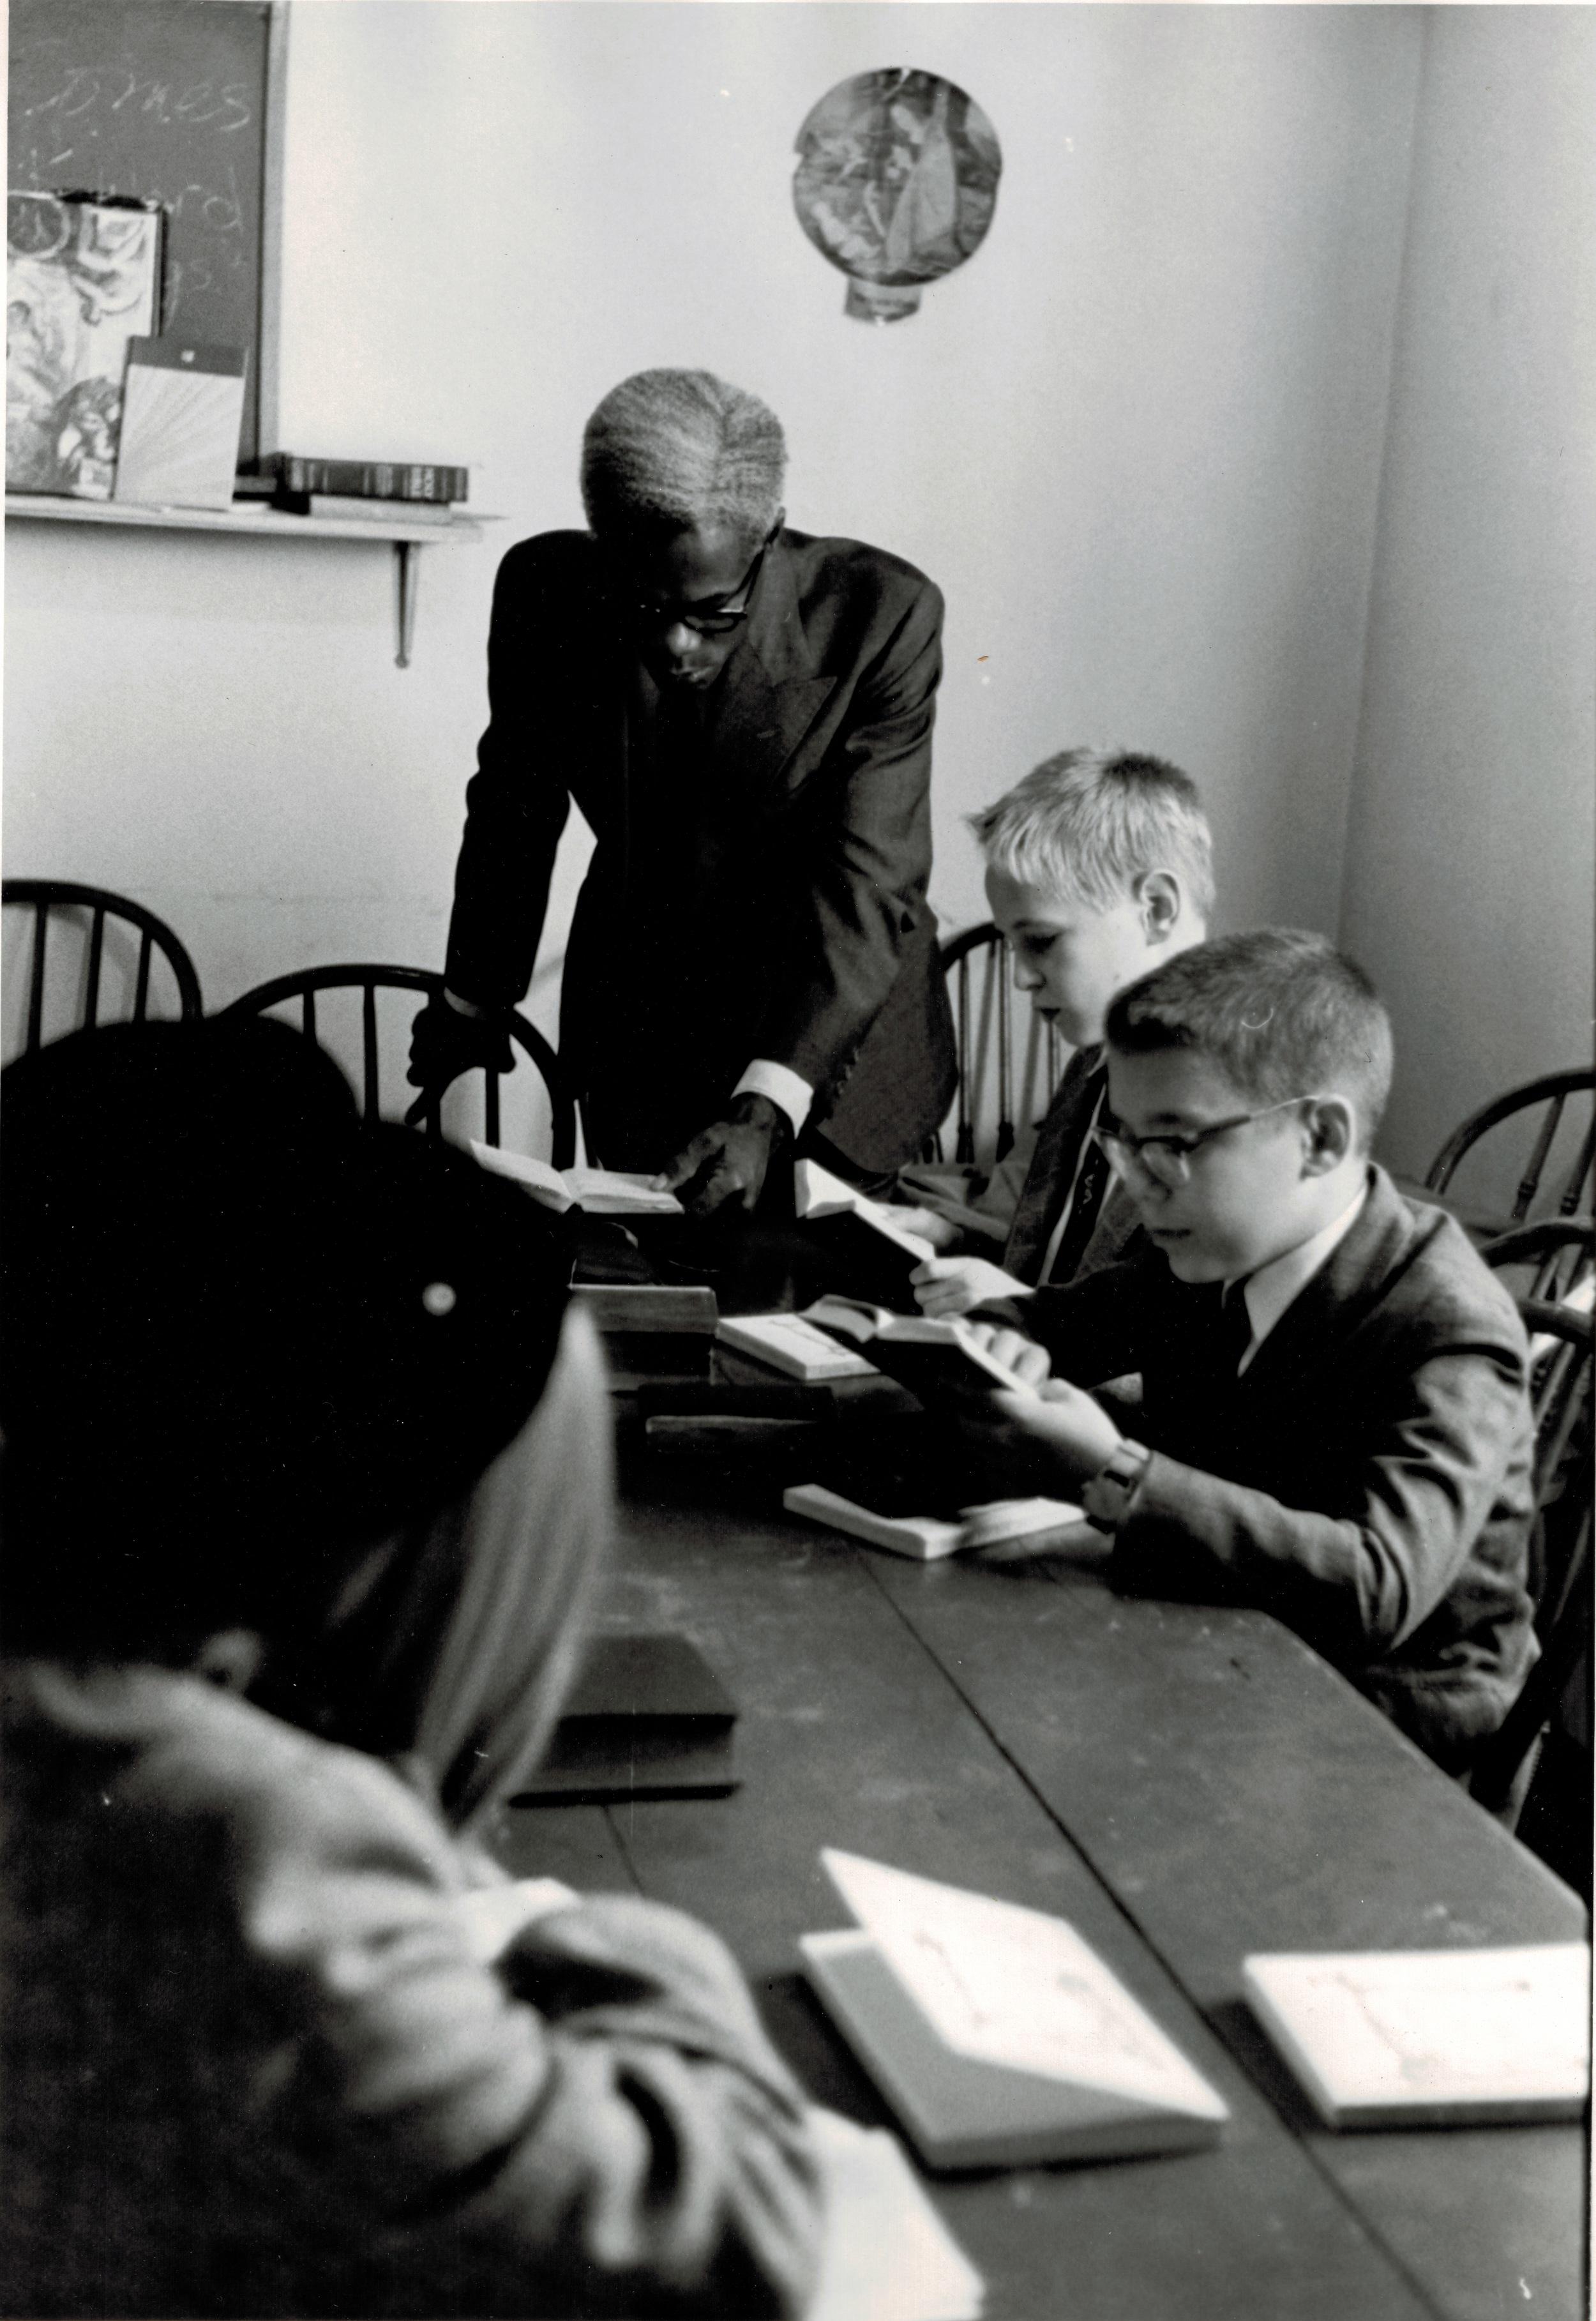 Albert Powell teaching Sunday School, 1962.